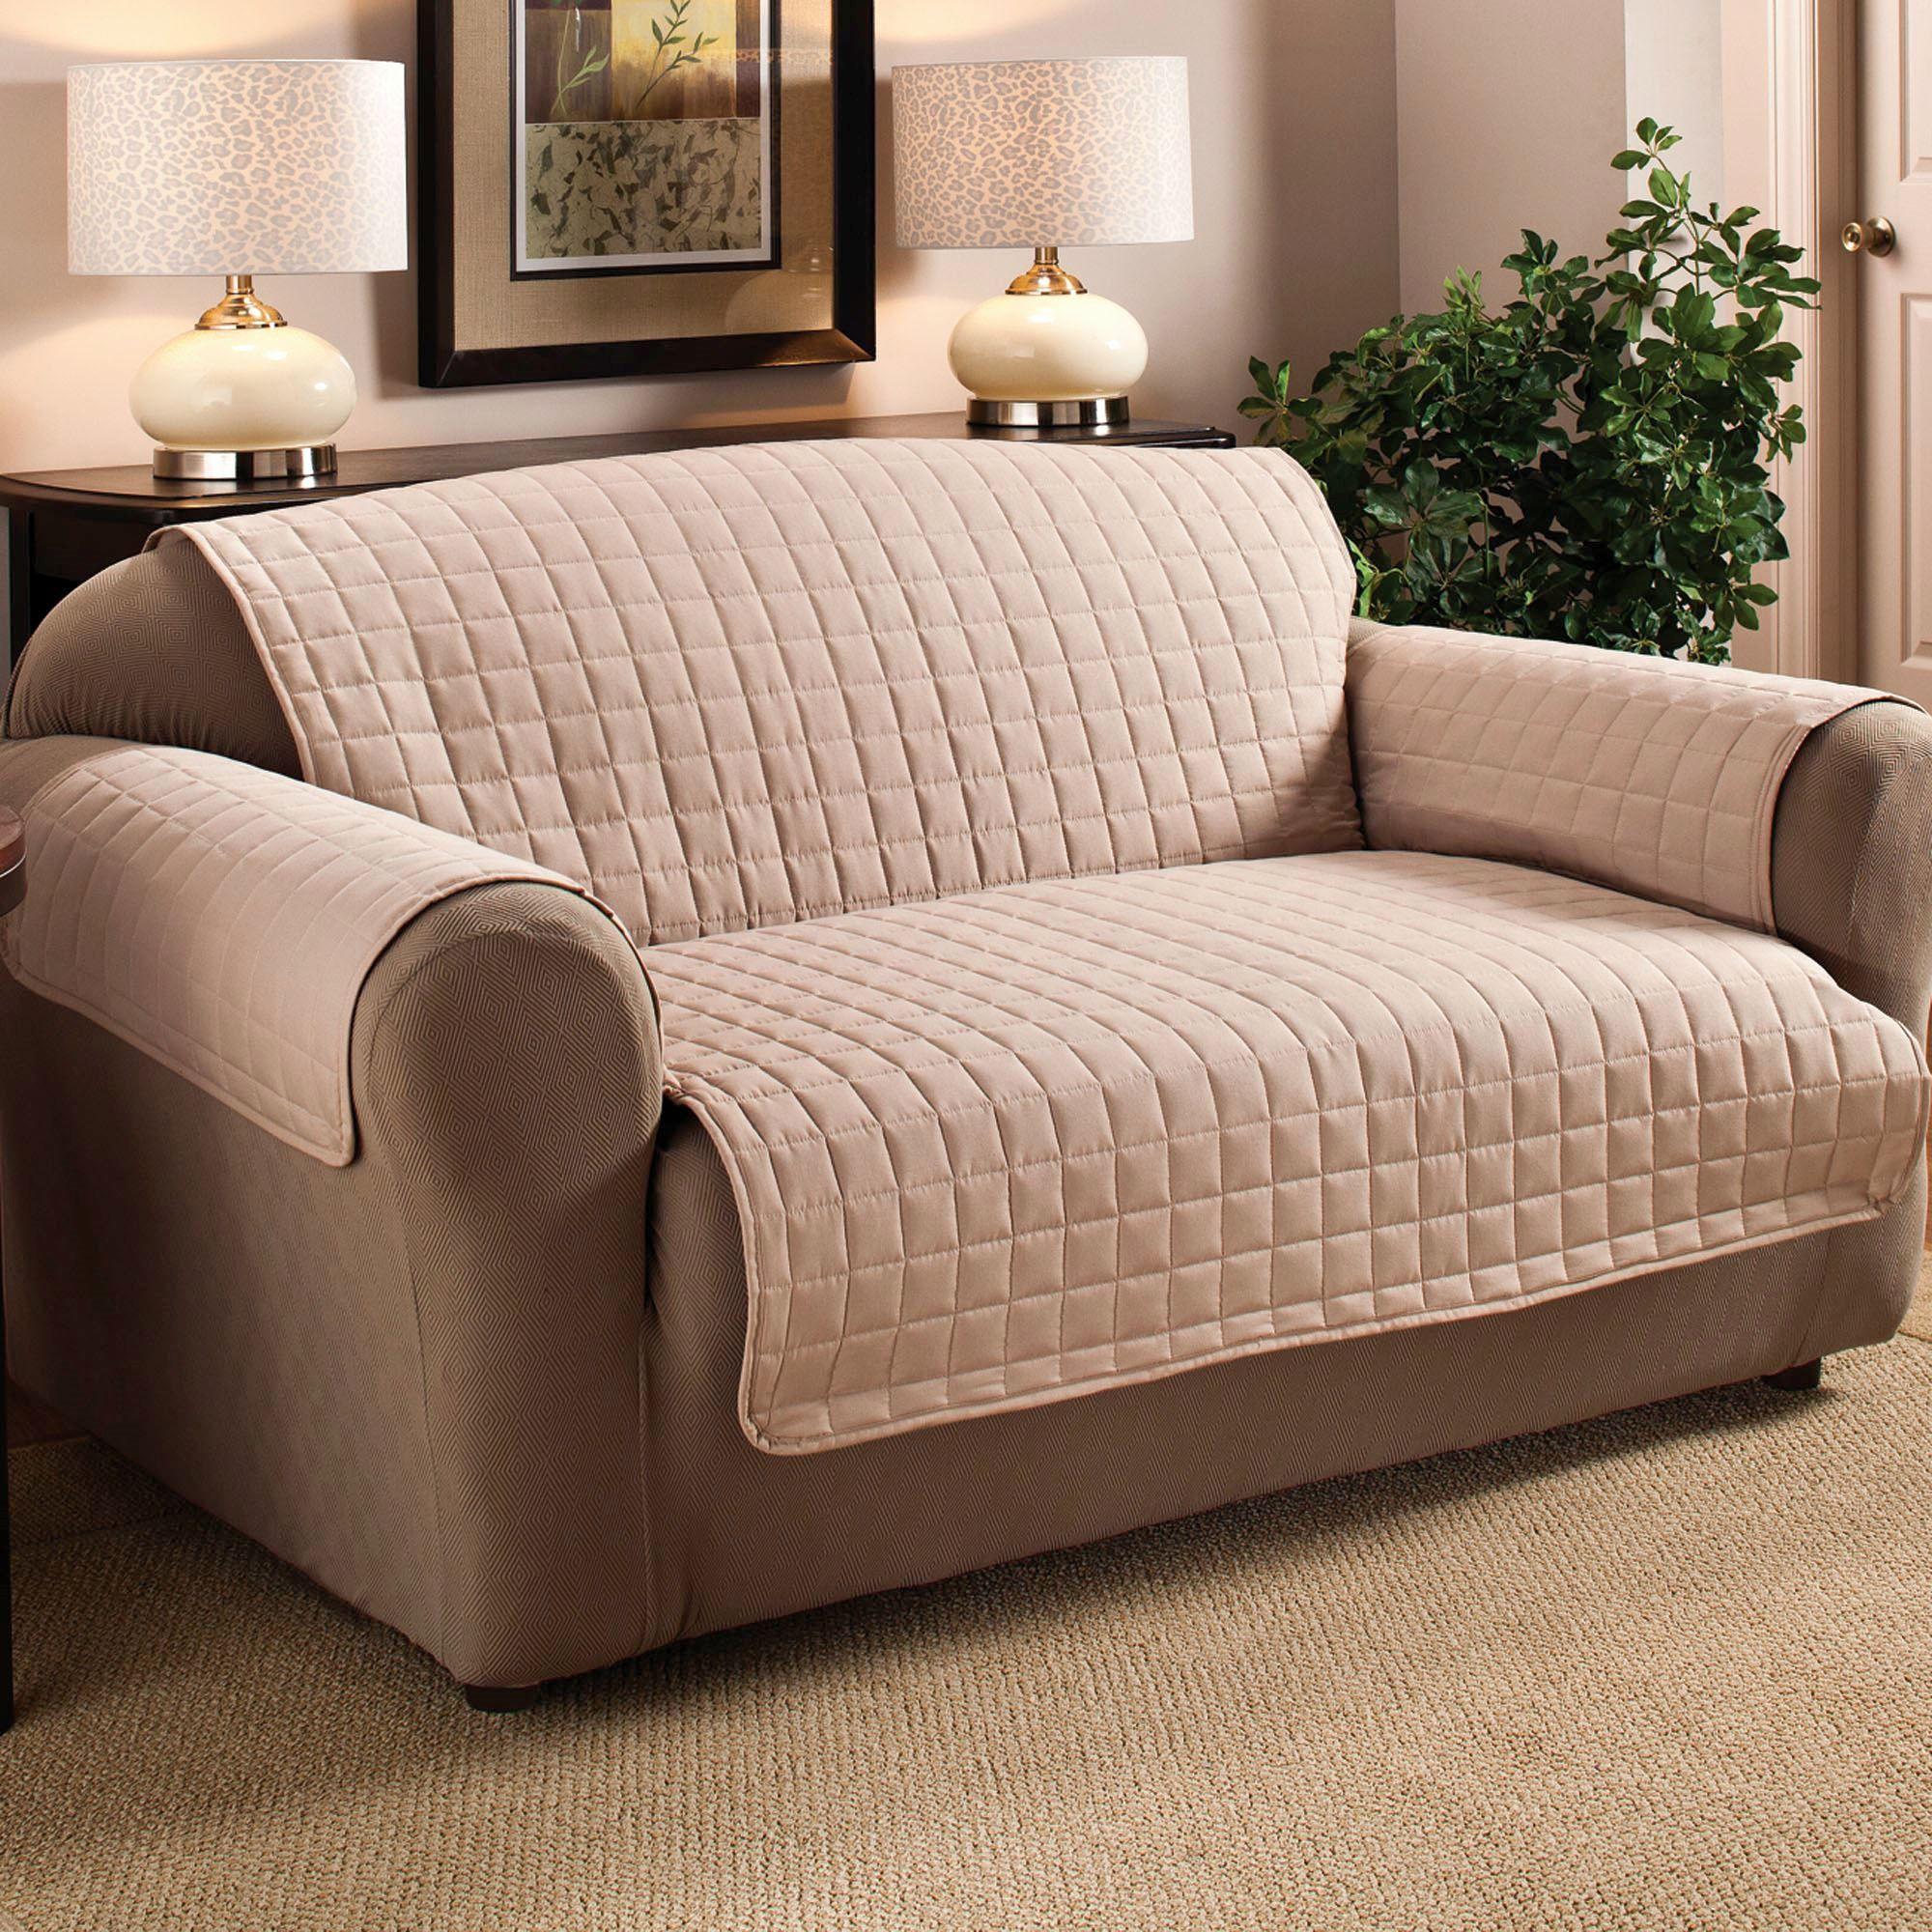 New Microfiber sofa Uk Microfiber sofa Uk Awesome